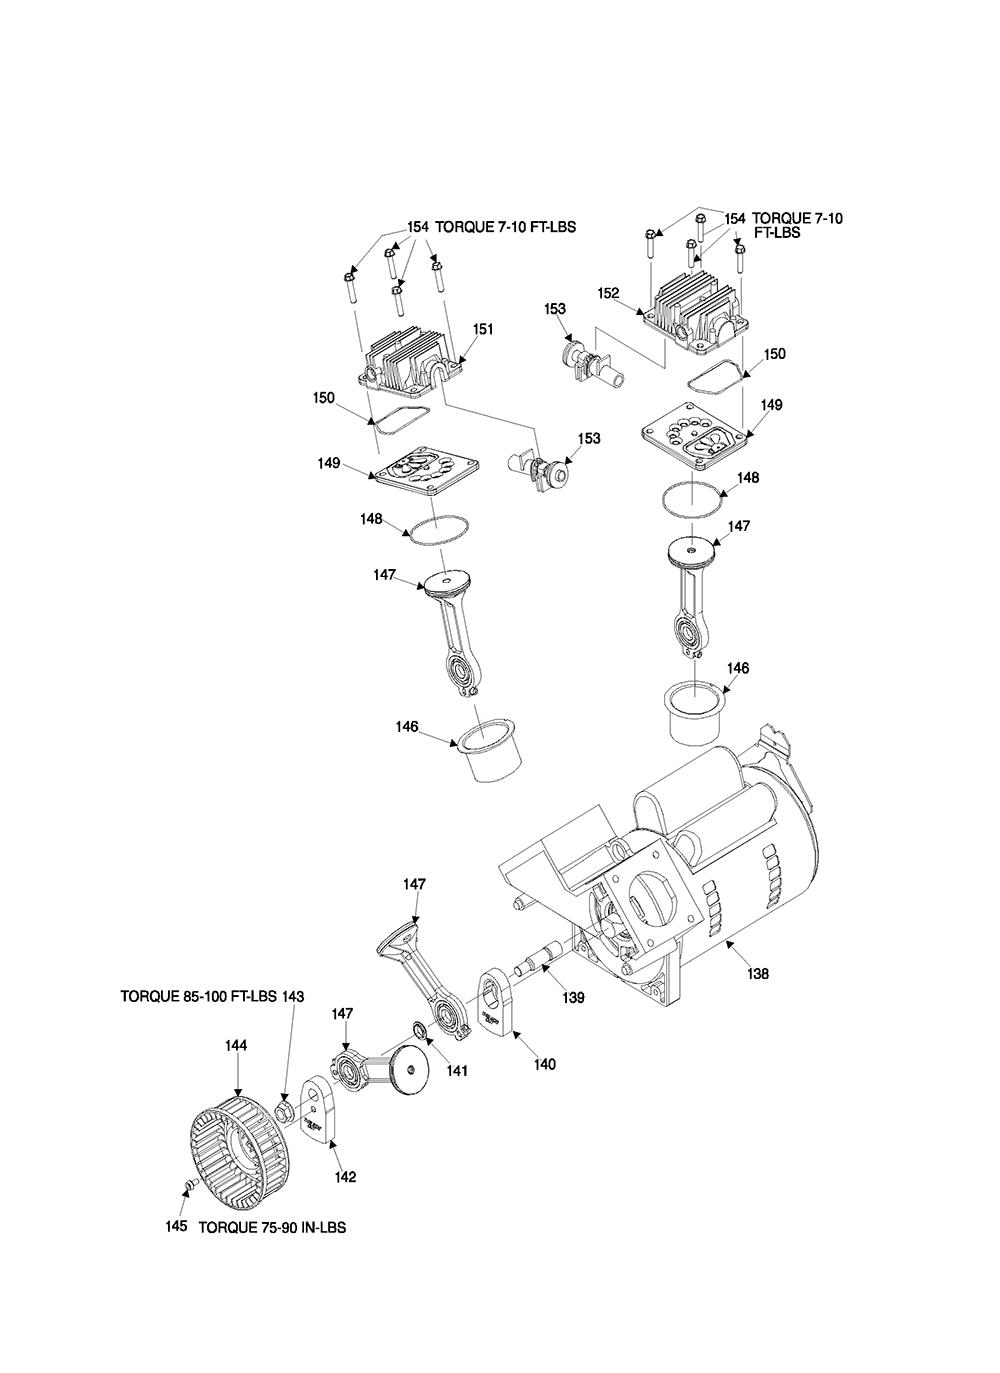 4UP74-BlackandDecker-T1-PB-1Break Down